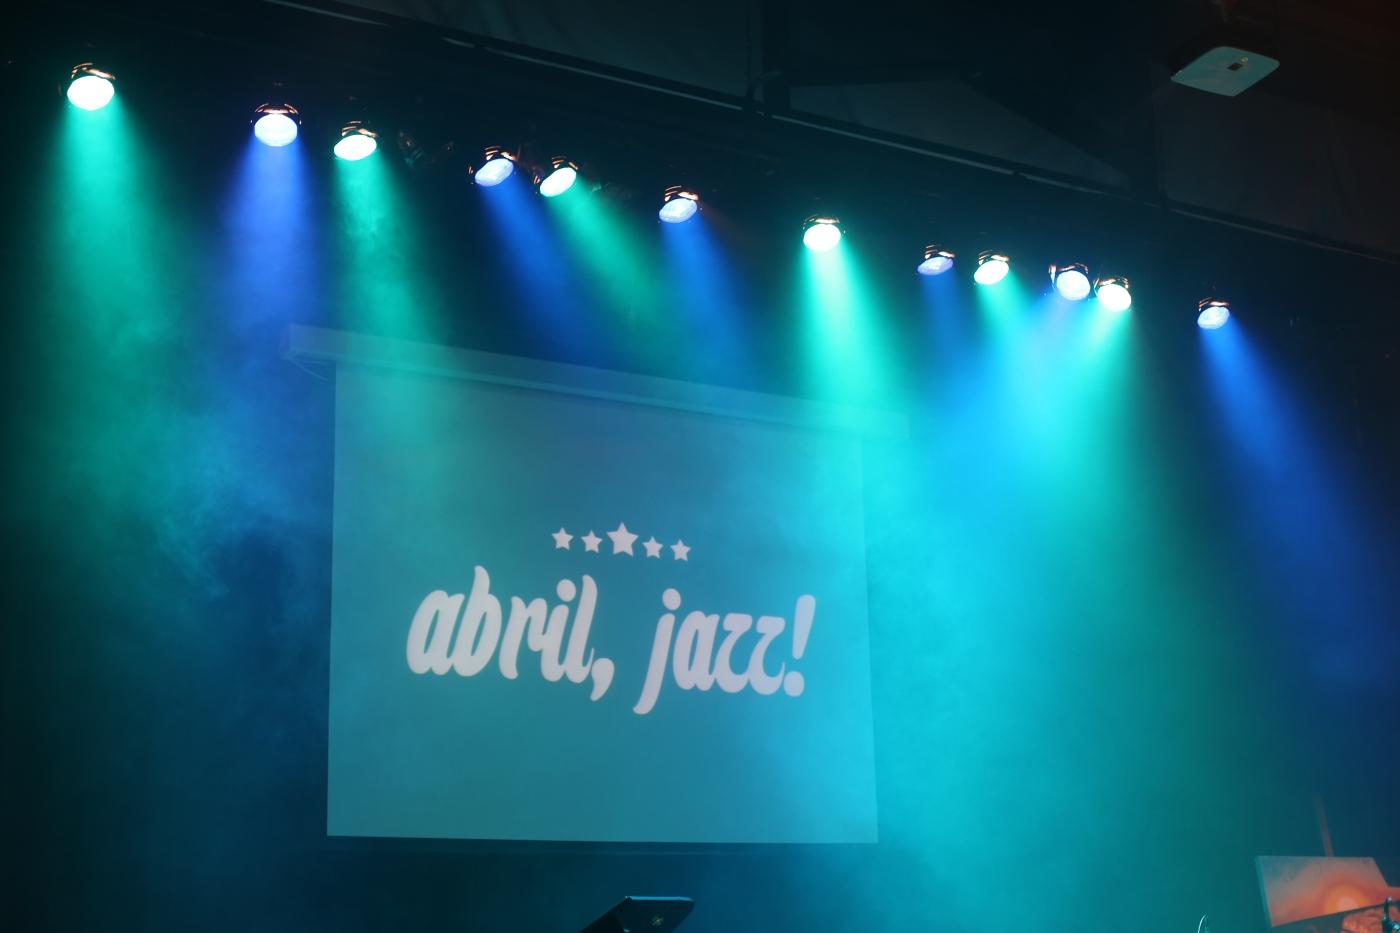 Abril, Jazz!